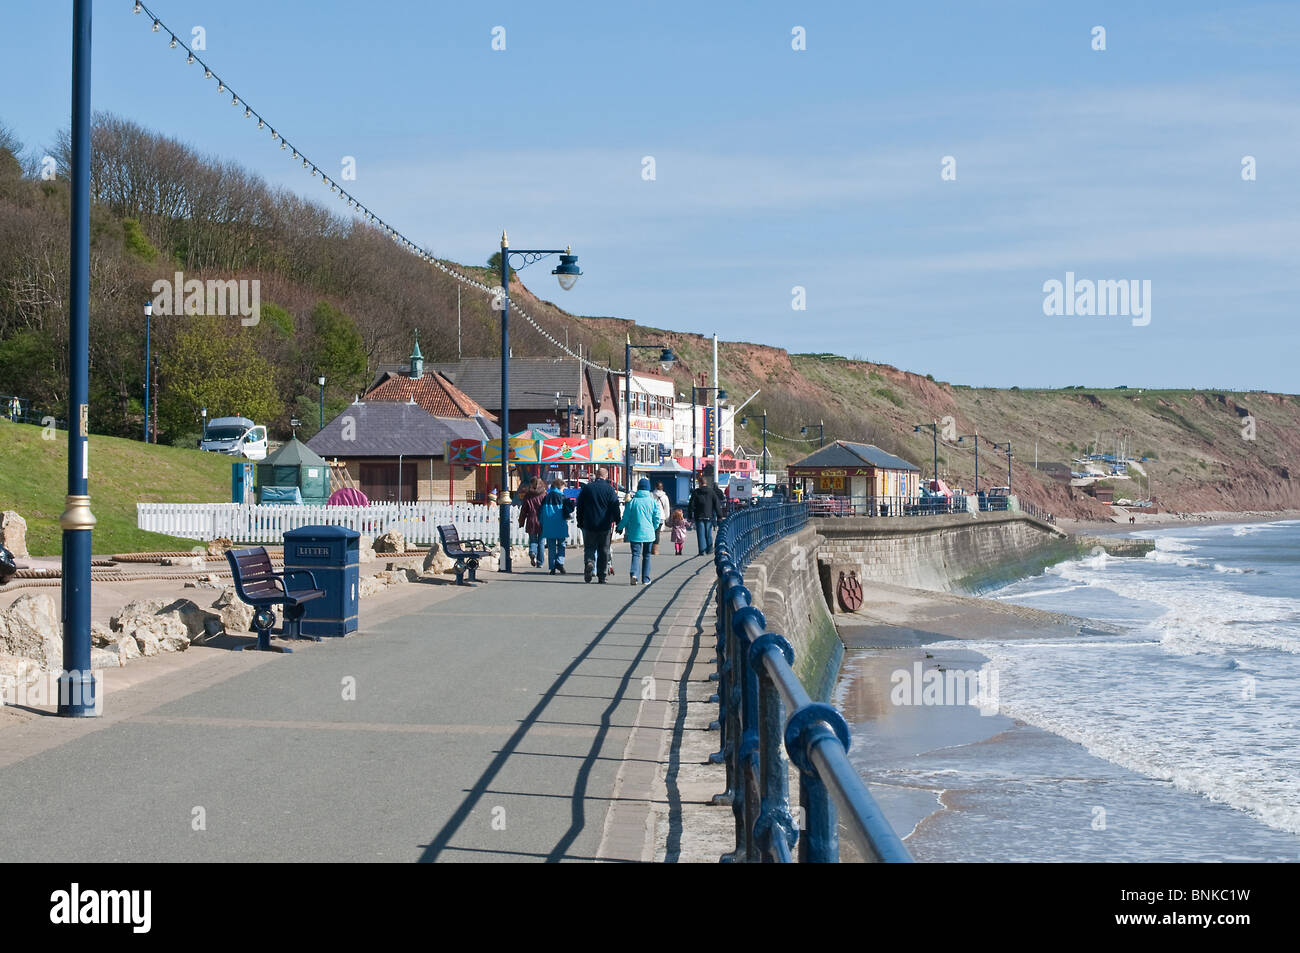 Filey promenade, East Coast of Yorkshire - Stock Image